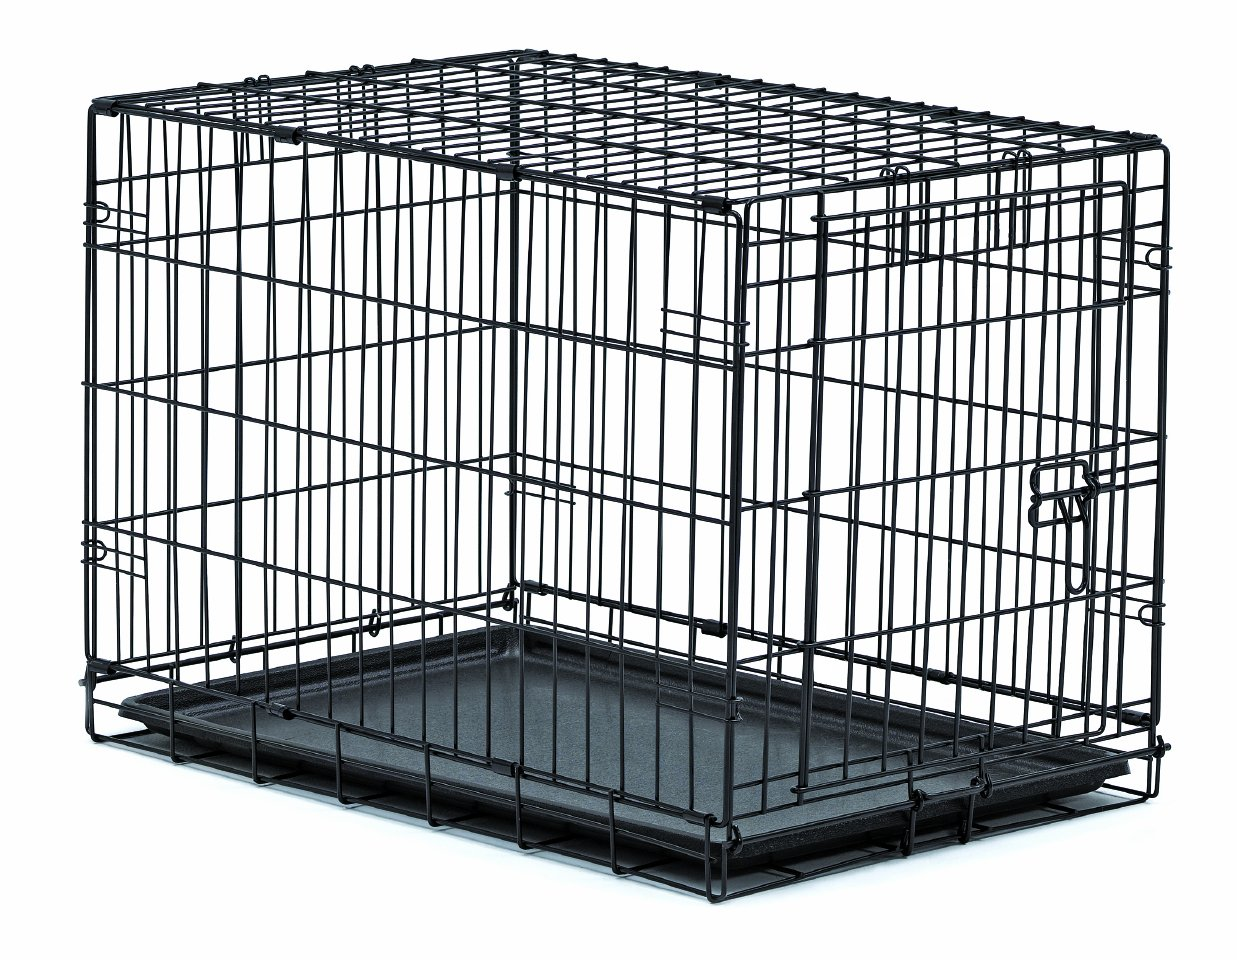 amazoncom  new world  folding metal dog crate includes leak  - amazoncom  new world  folding metal dog crate includes leakproofplastic tray dog crate measures l x w x h inches for medium dogbreeds  pet